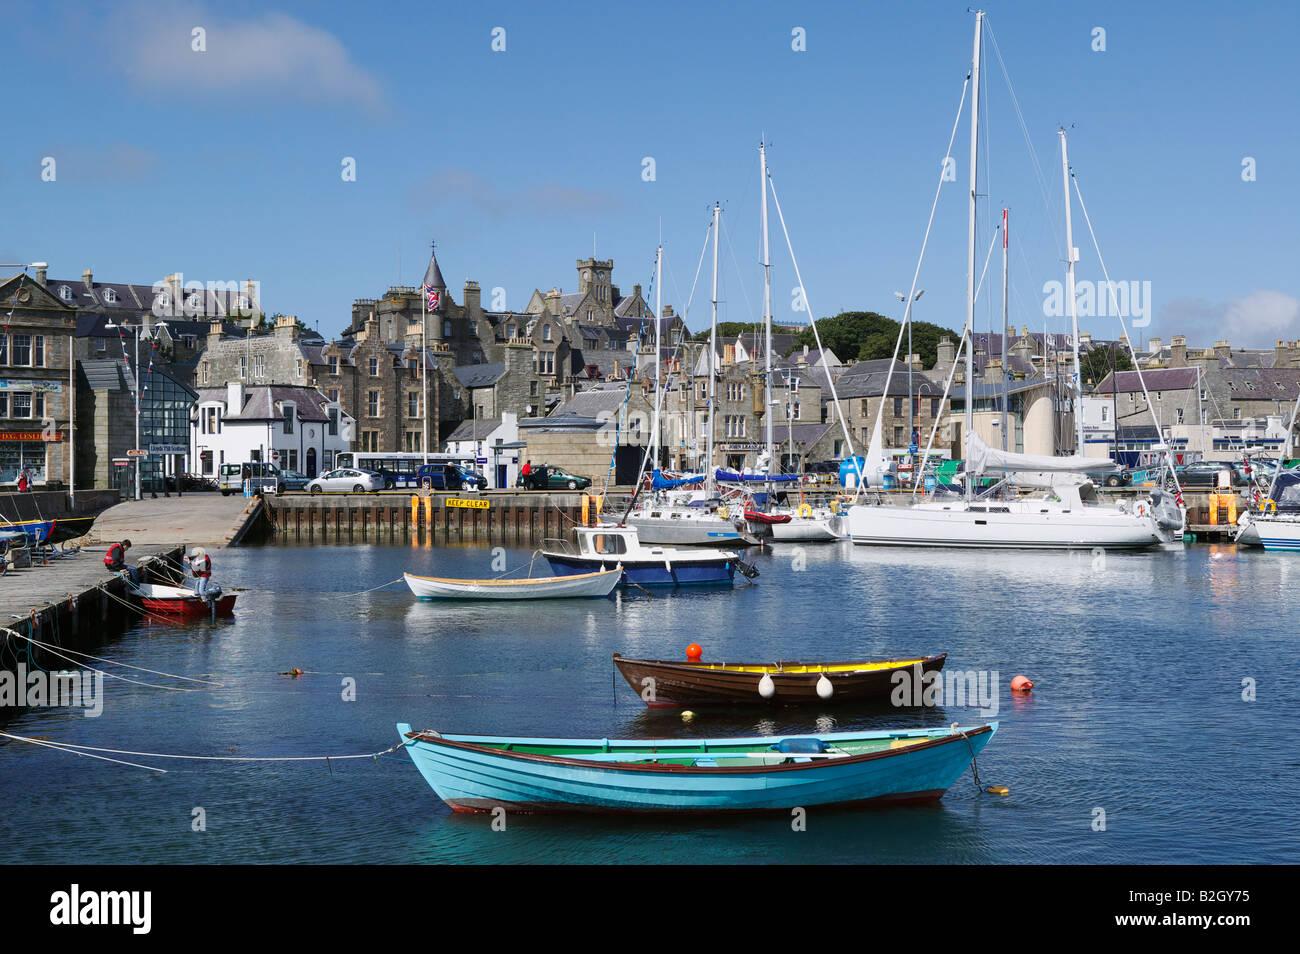 The Small Boat Harbour in Lerwick, Shetland Isles, Scotland, UK - Stock Image